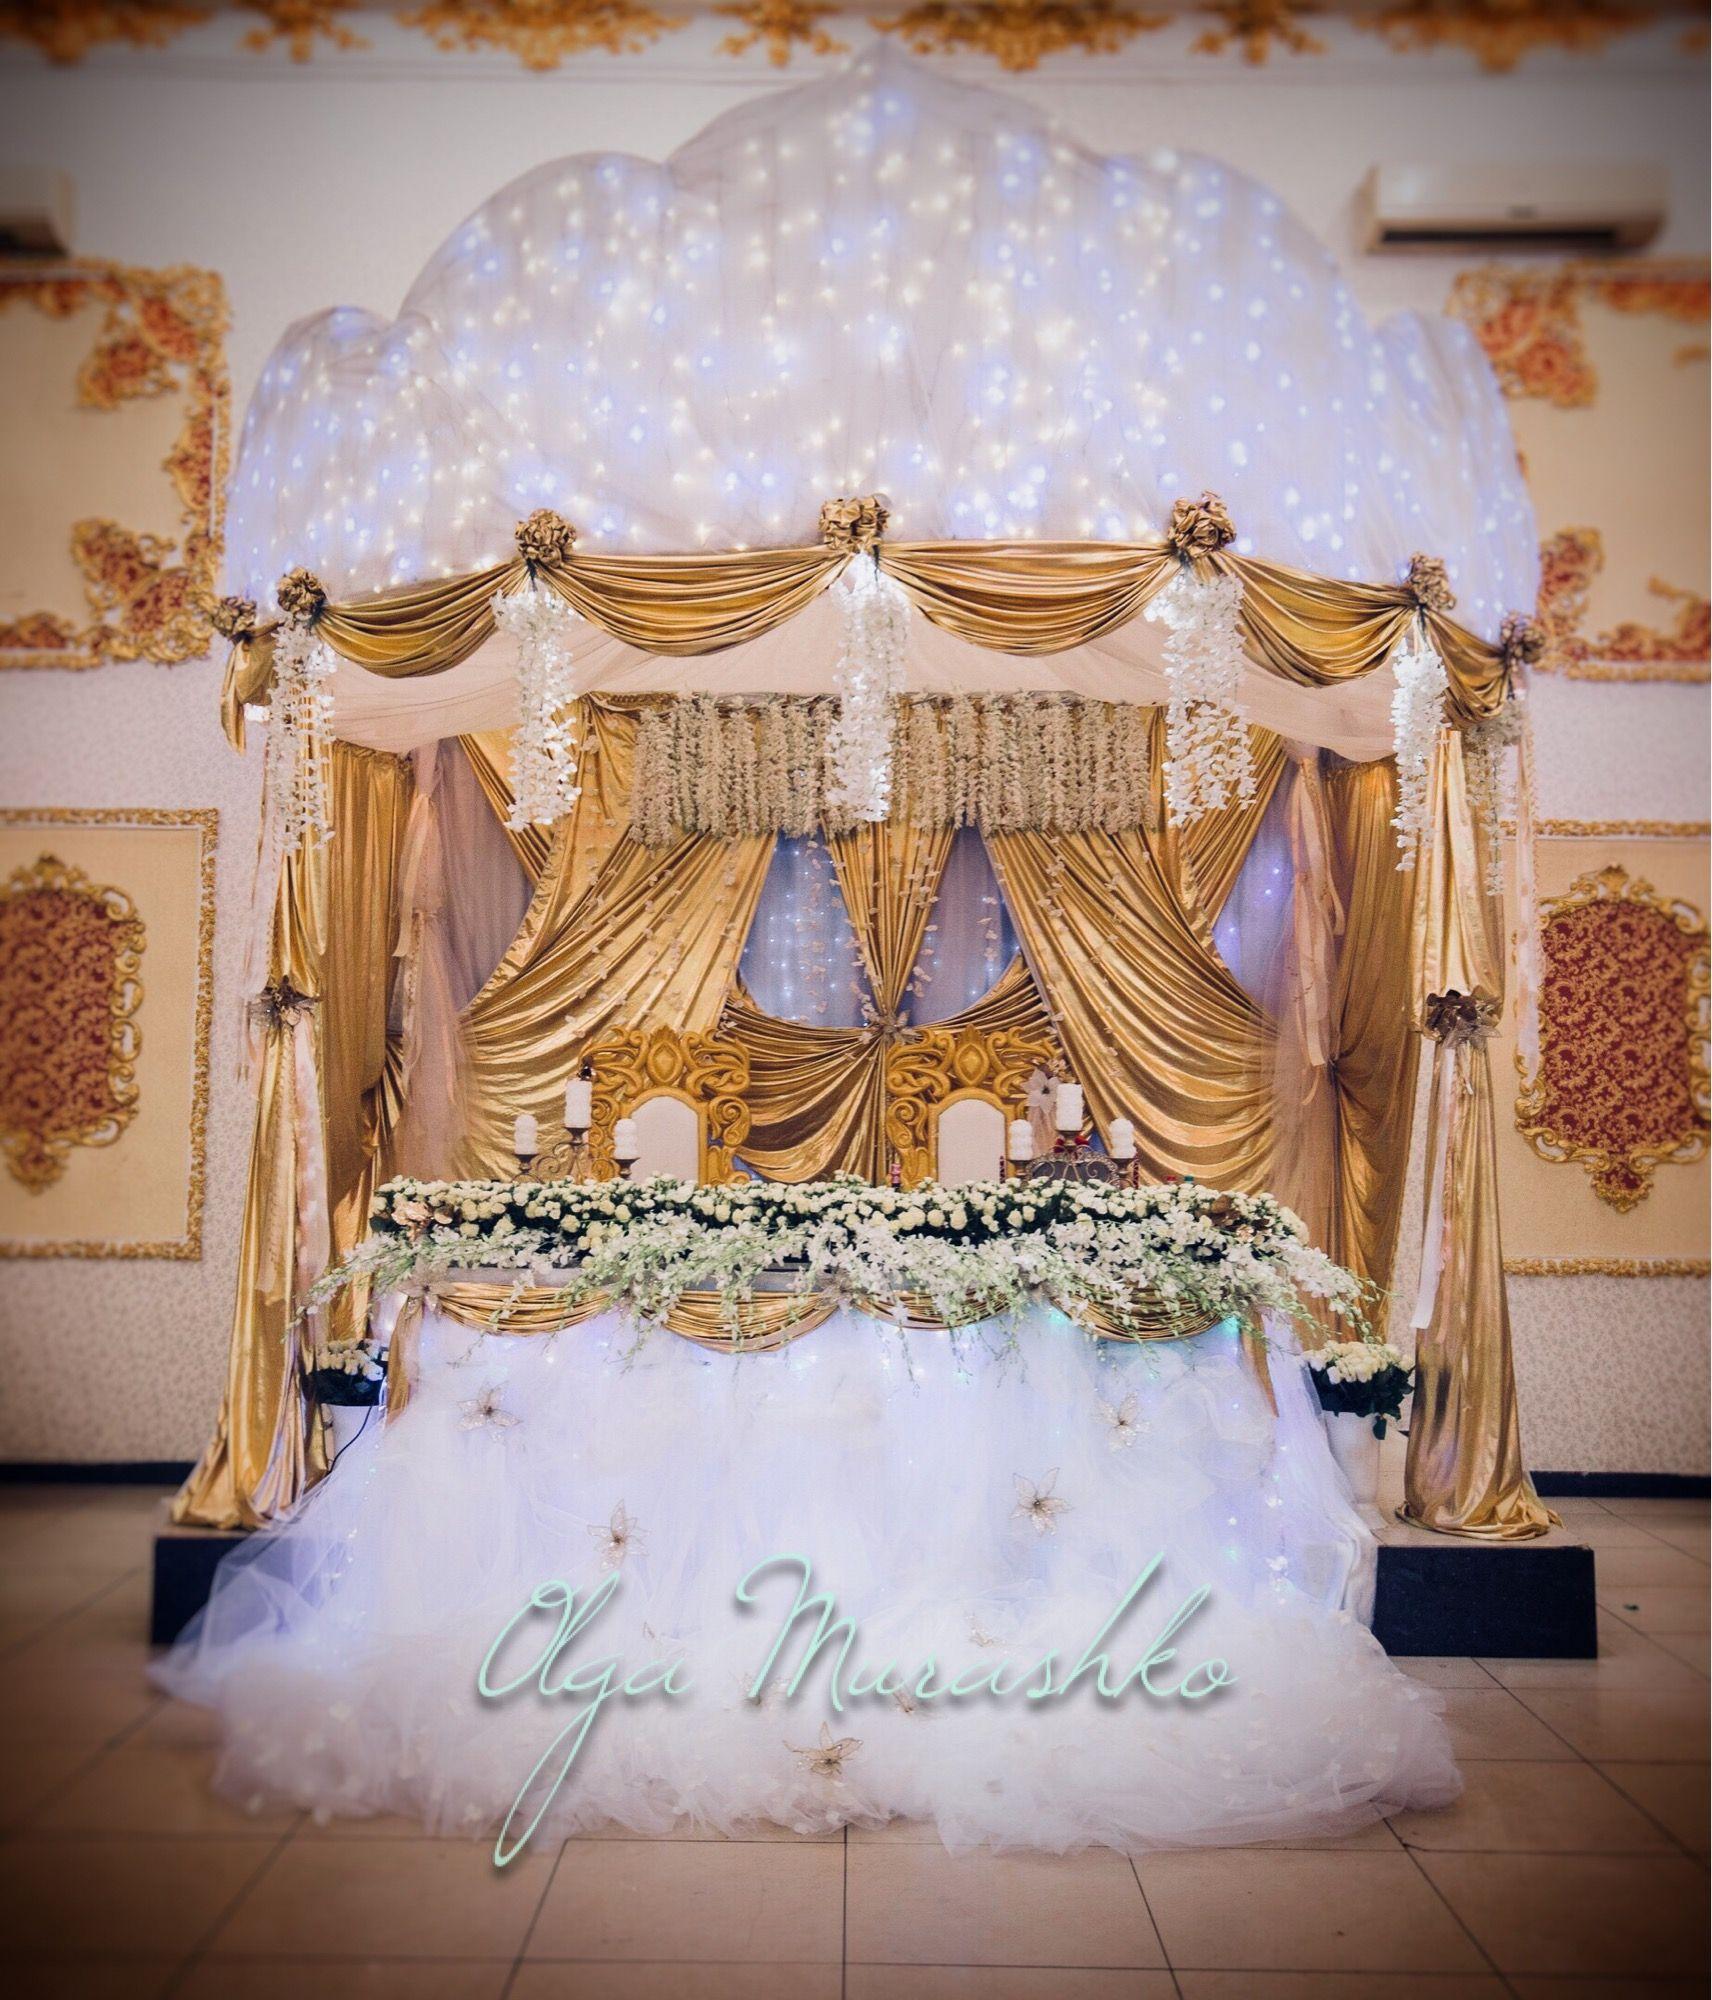 White wedding decoration ideas  Wedding decoration by Olga Murashko presidium in gold and white